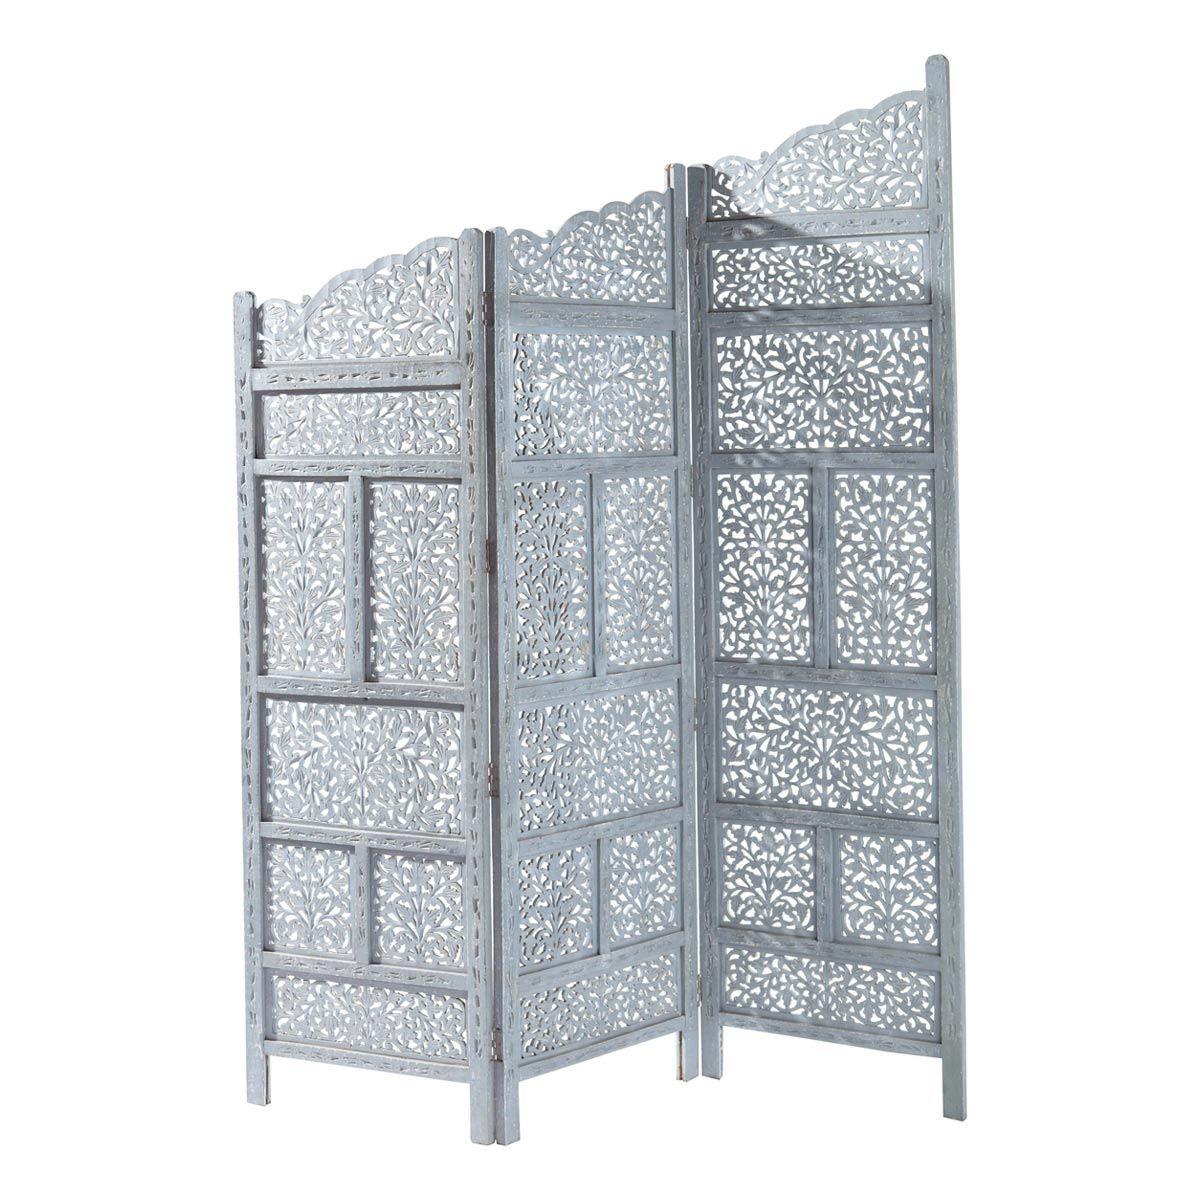 Raumteiler Aus Holz B 152 Cm Grau Raumteiler Paravent Raumteiler Coole Raume